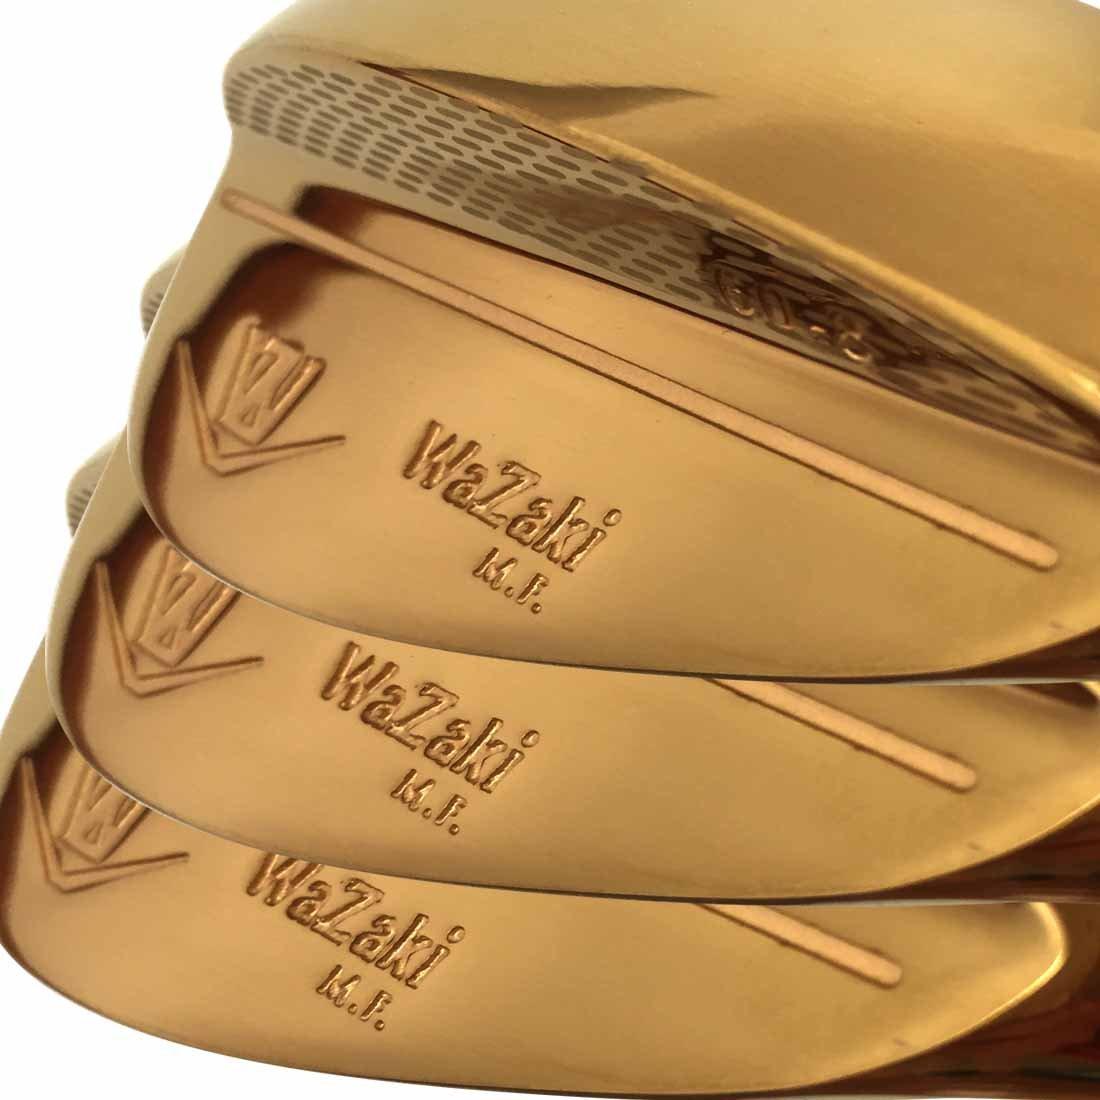 Wazaki Mプロゴルフクラブウェッジセッ右利き用 3本 ゴールド仕上げ 52 56 60度ロフト鍛造軟鉄 B01DND9L64